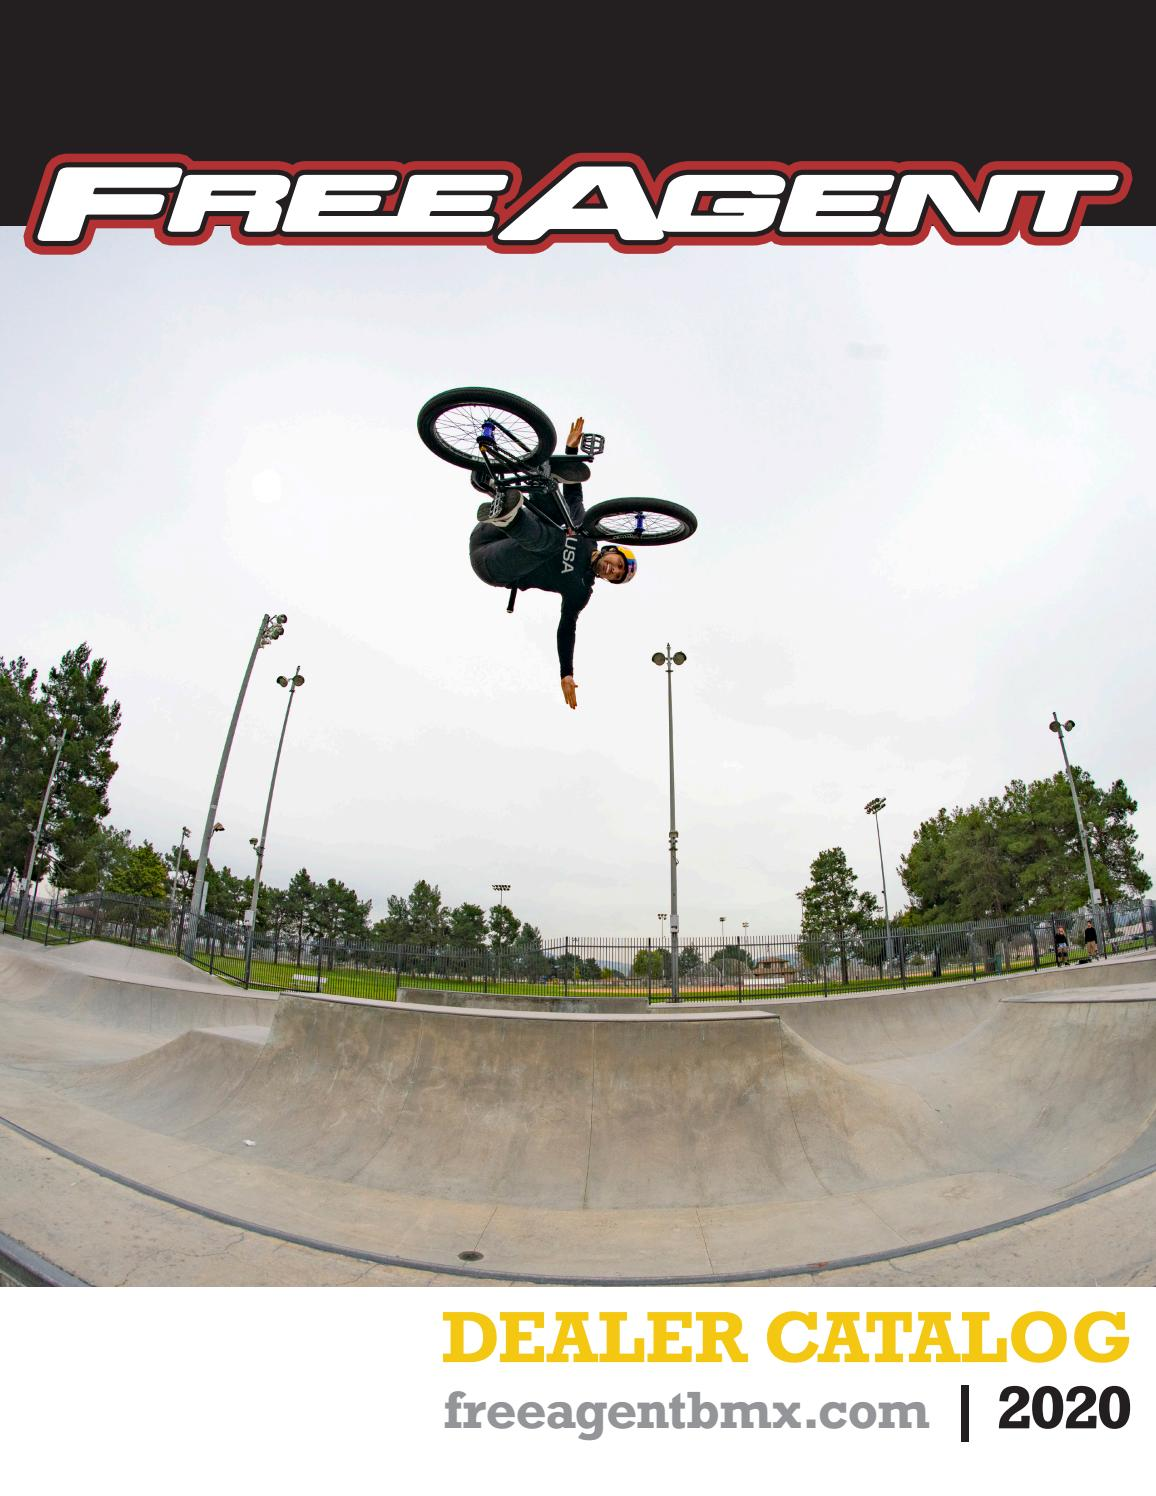 Free Agent Pivotal Street Bmx Saddle Black Bike